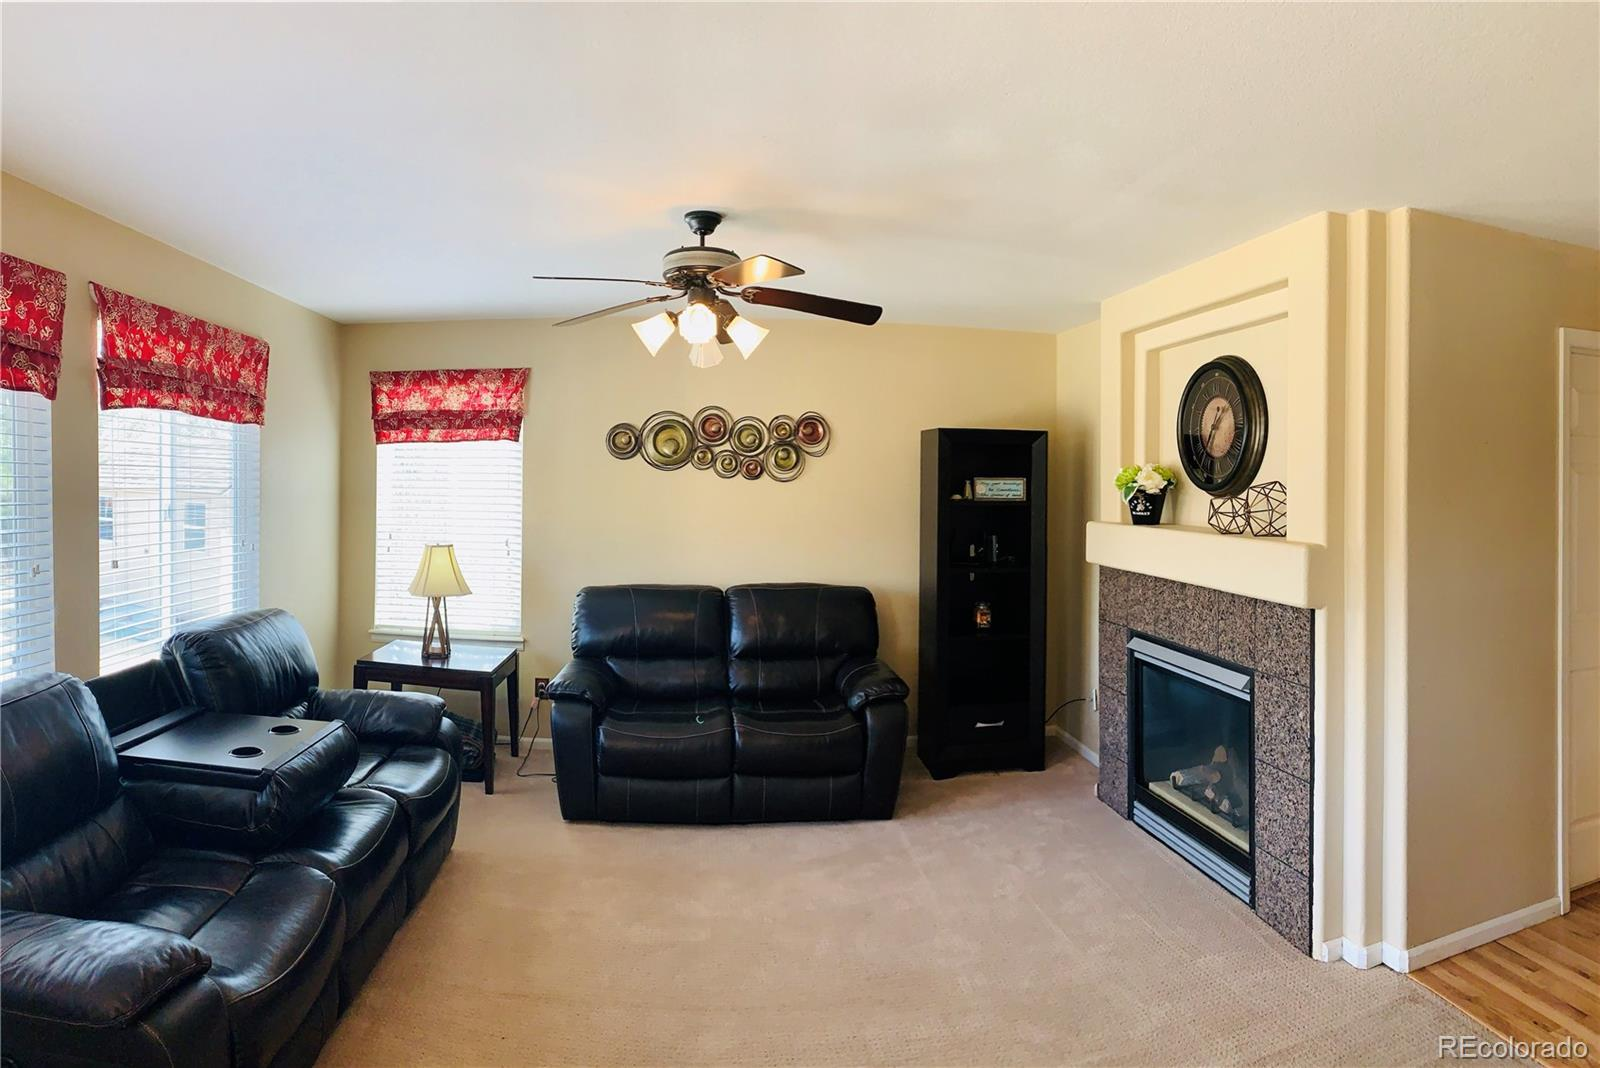 MLS# 9148338 - 7 - 21885 E Berry Place, Centennial, CO 80015